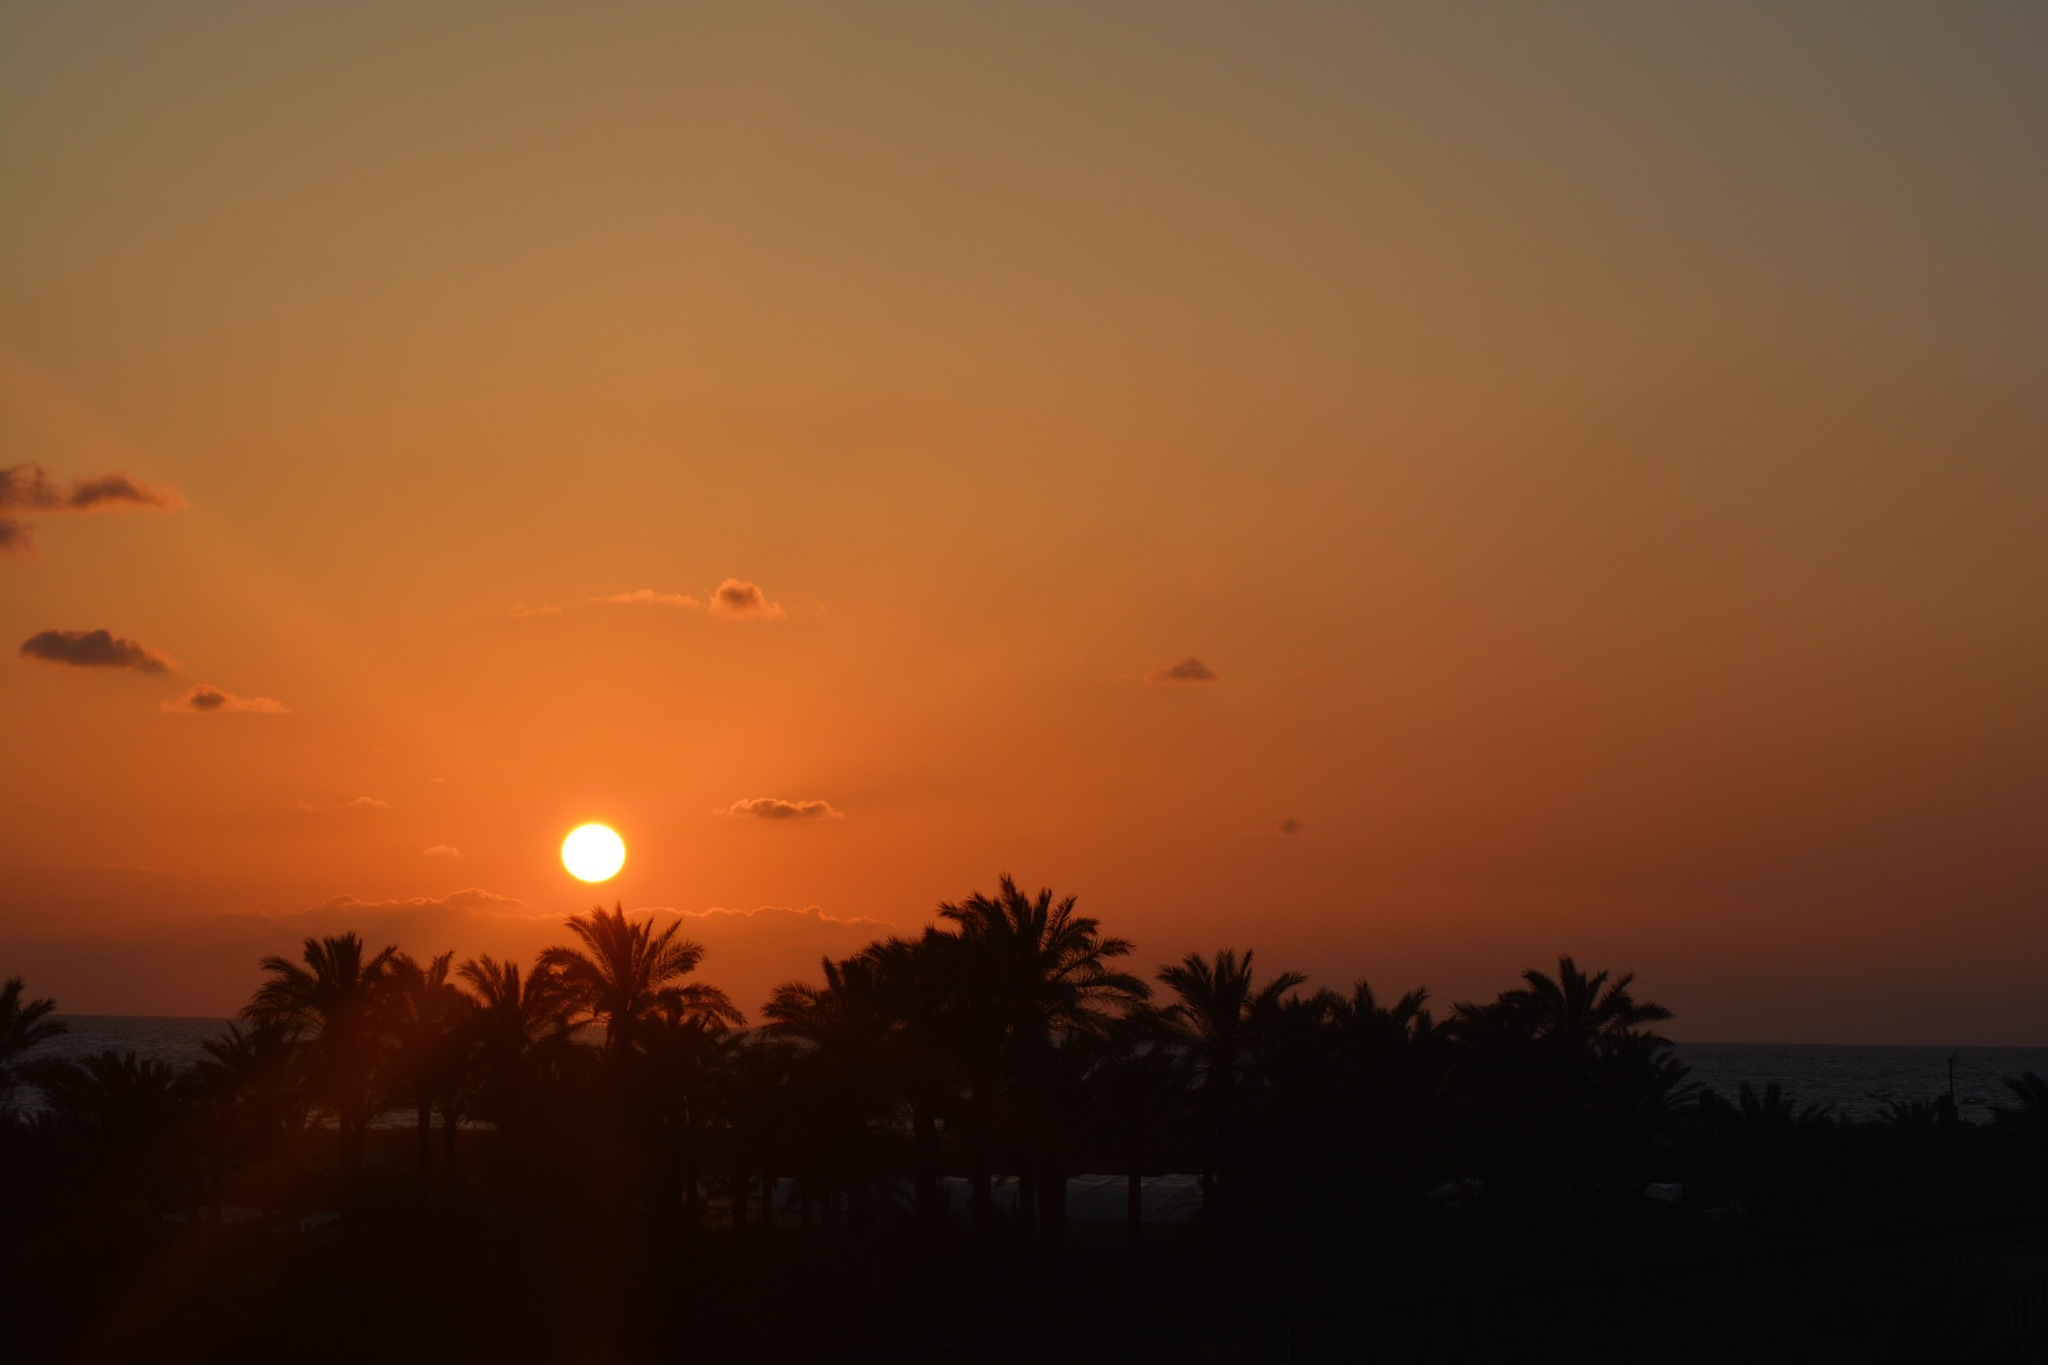 Sunset by amanyshammala